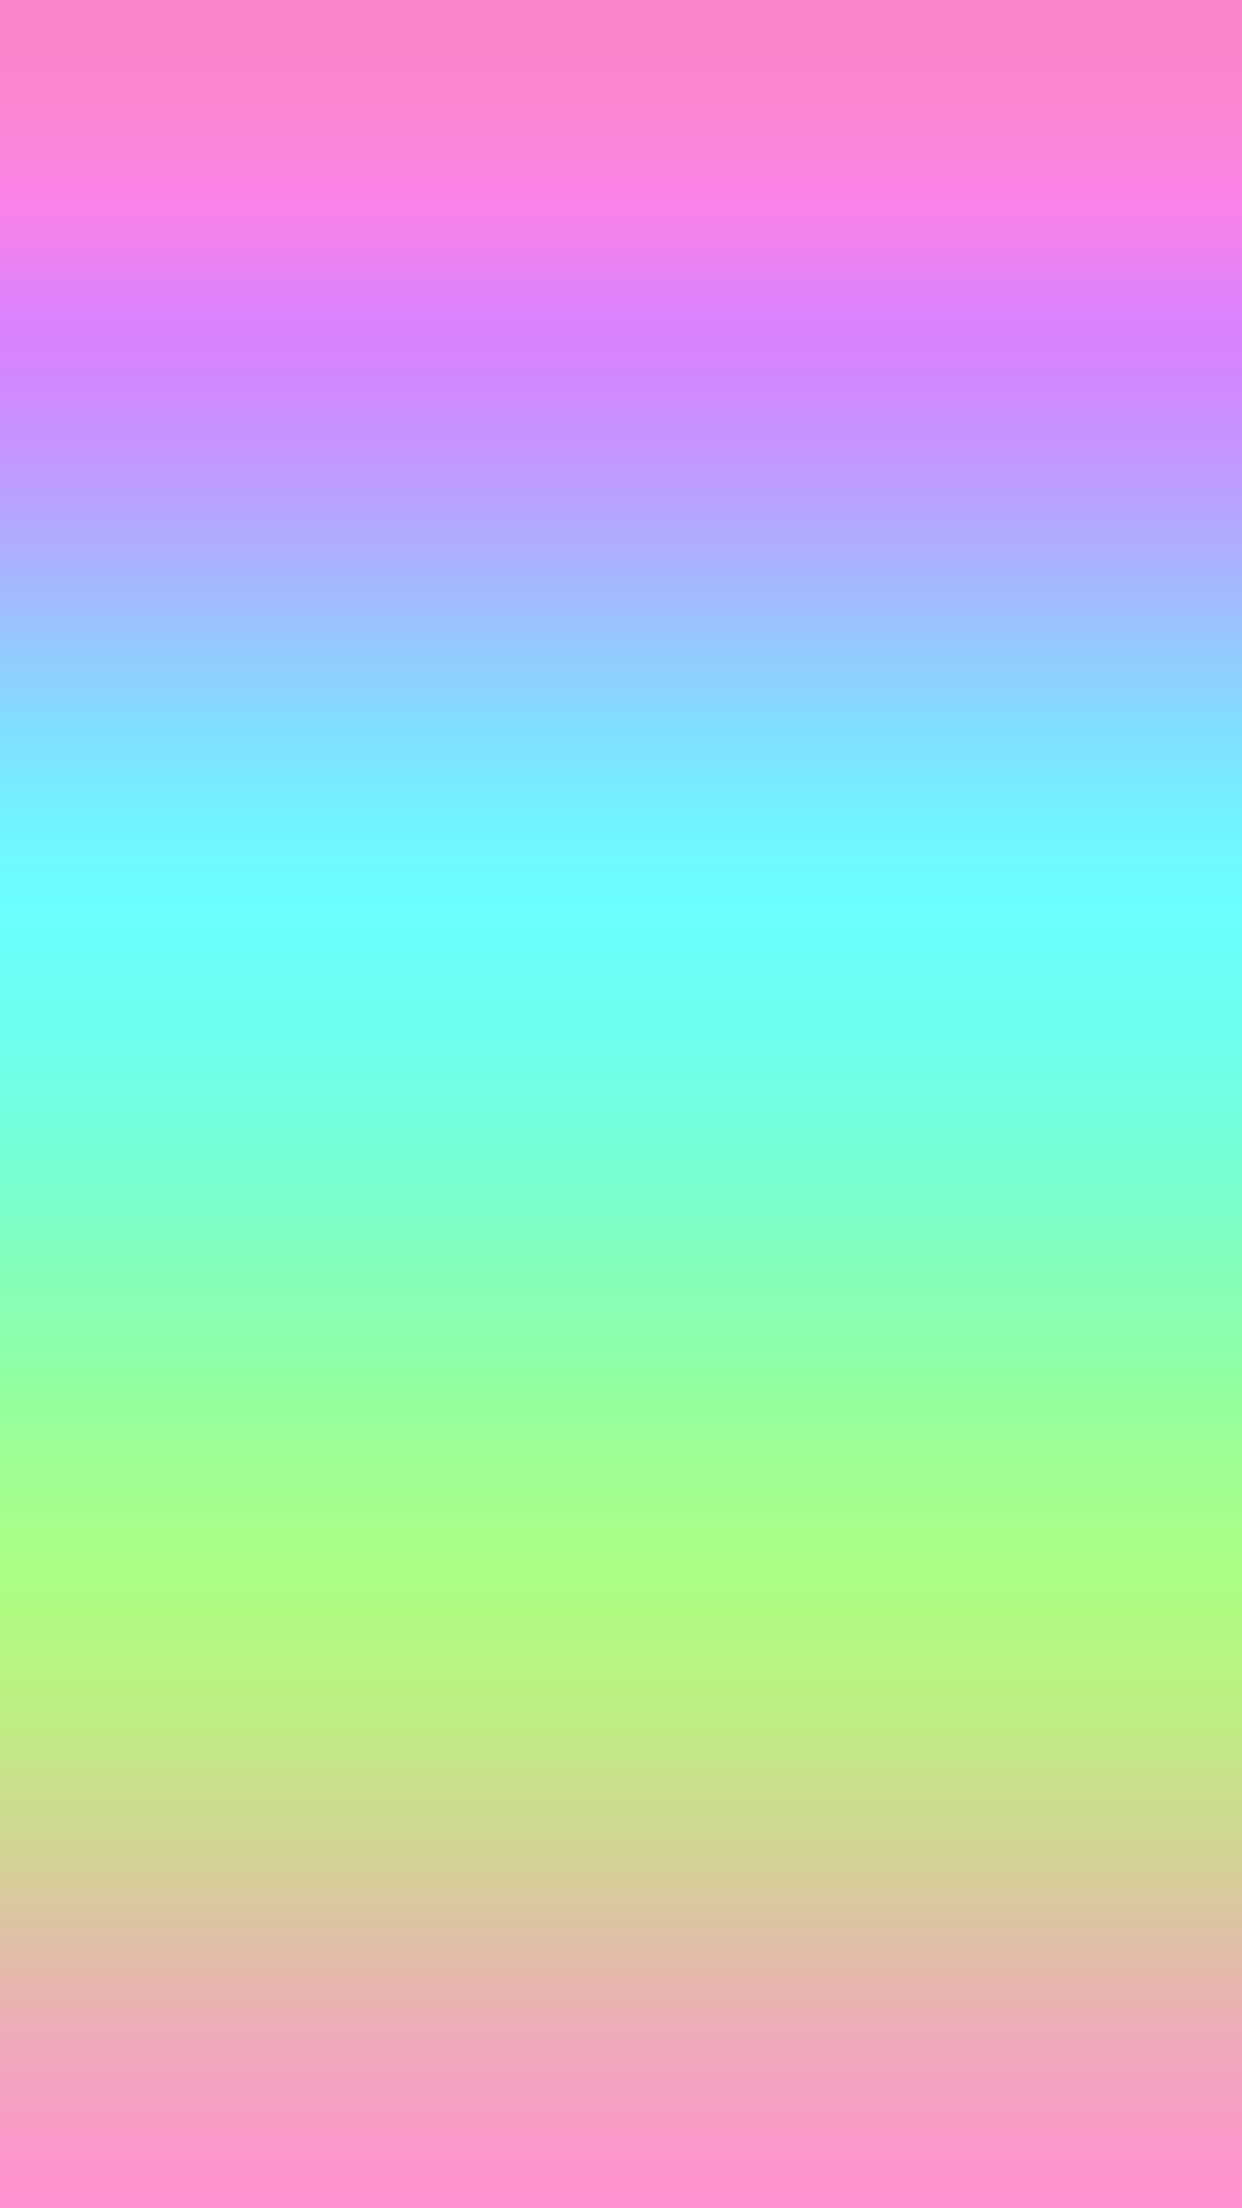 Gradient Ombre Pink Blue Purple Green Wallpaper Hd Iphone